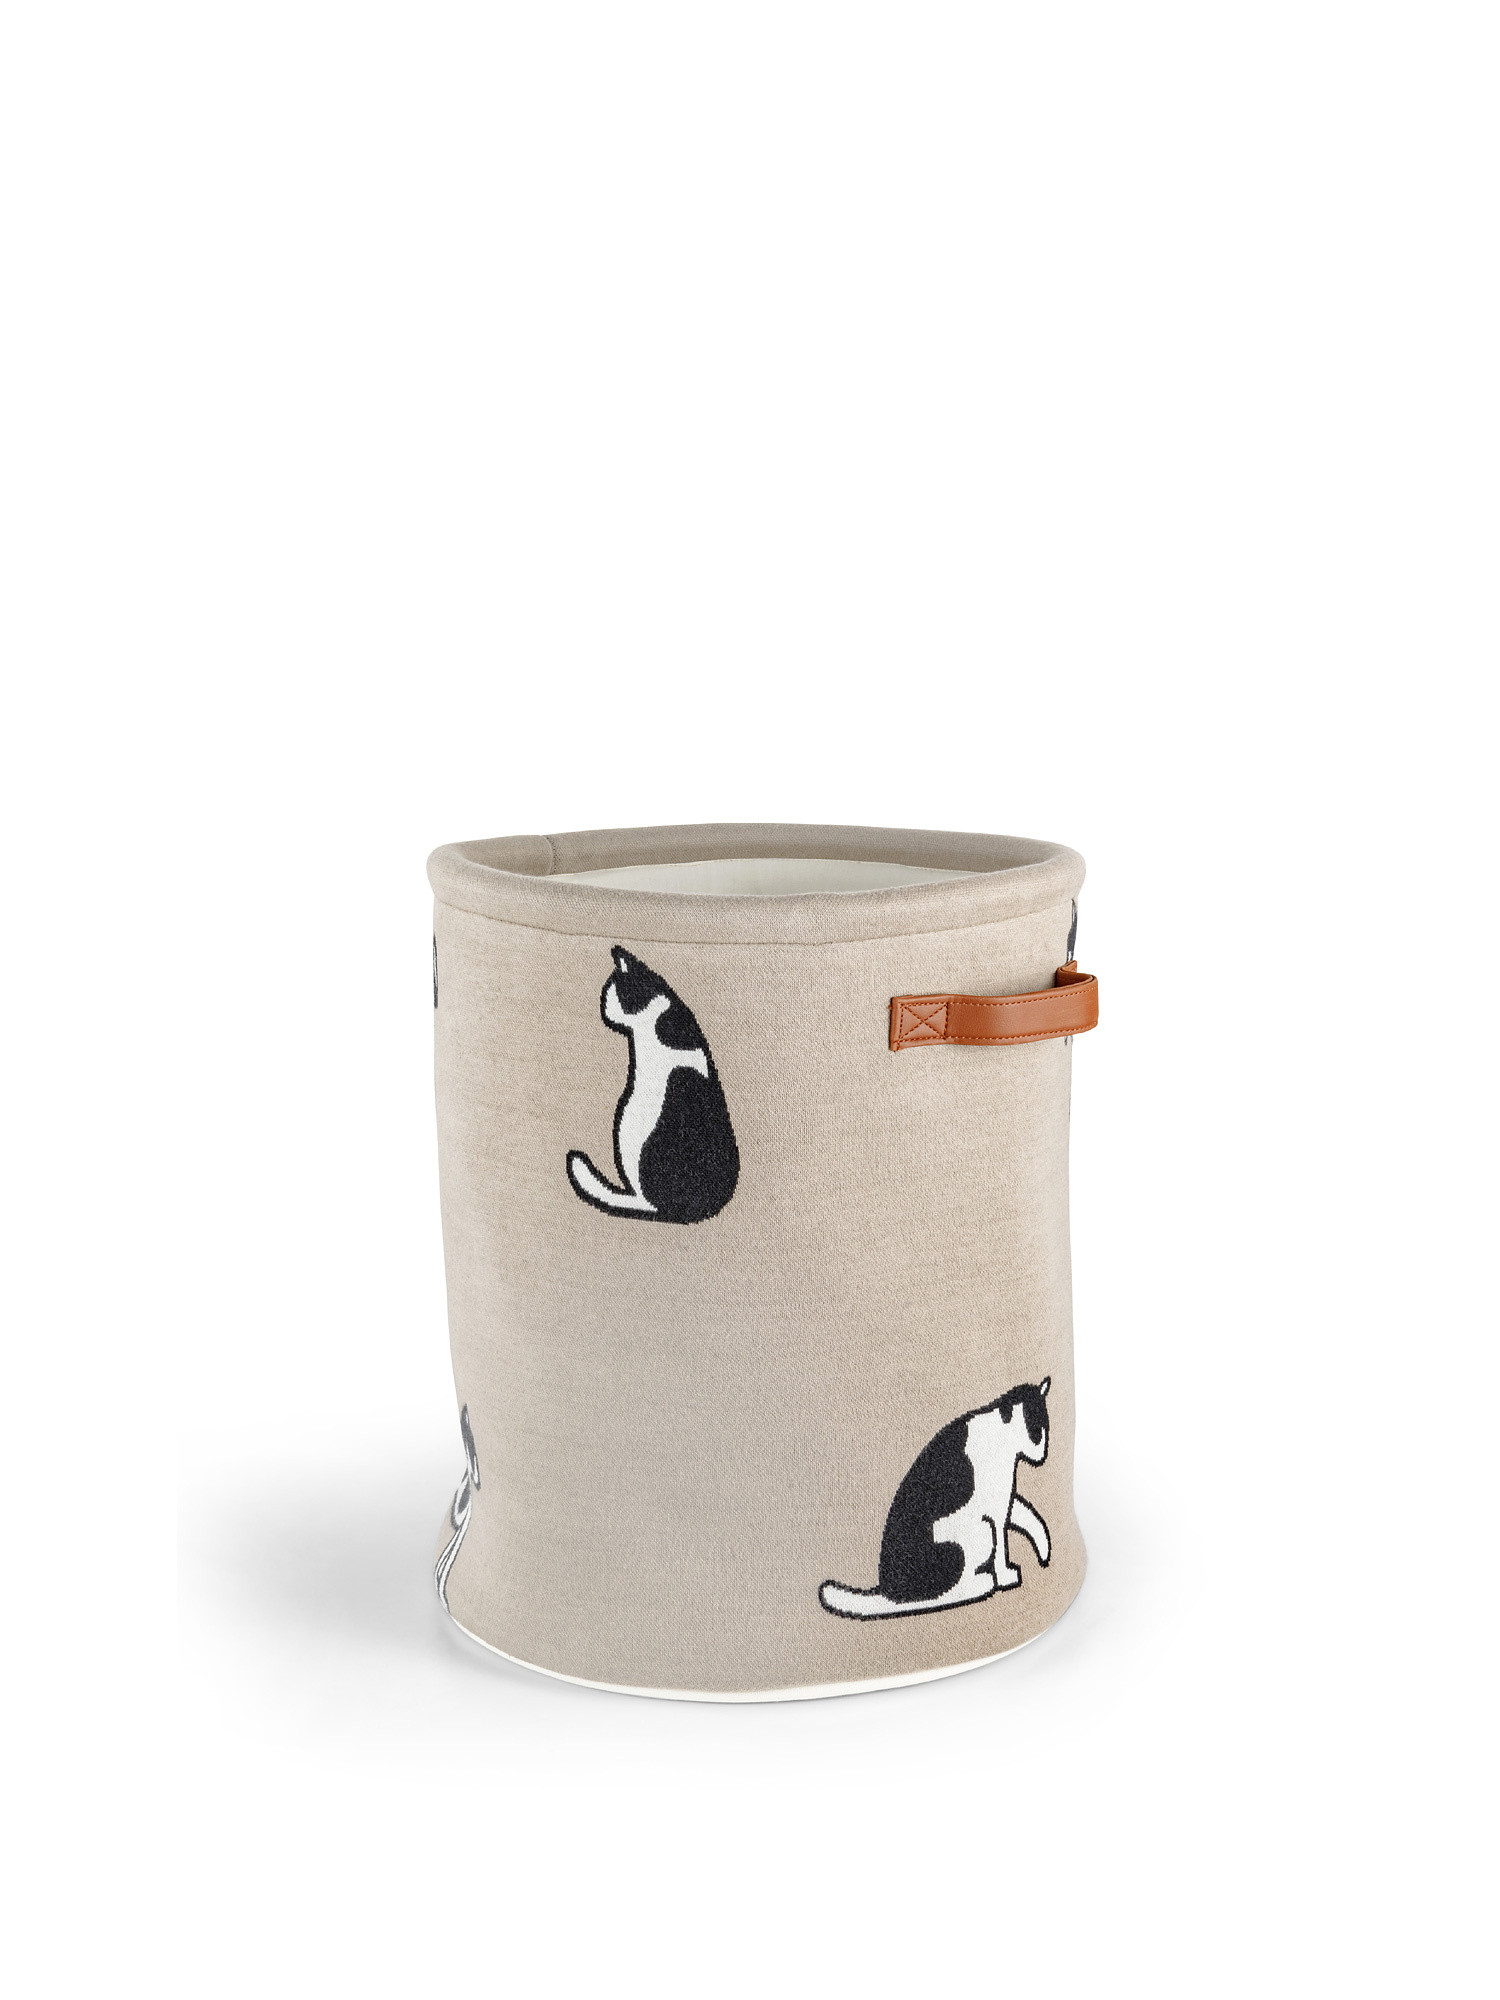 Cesto storage motivo gatti, Beige chiaro, large image number 3